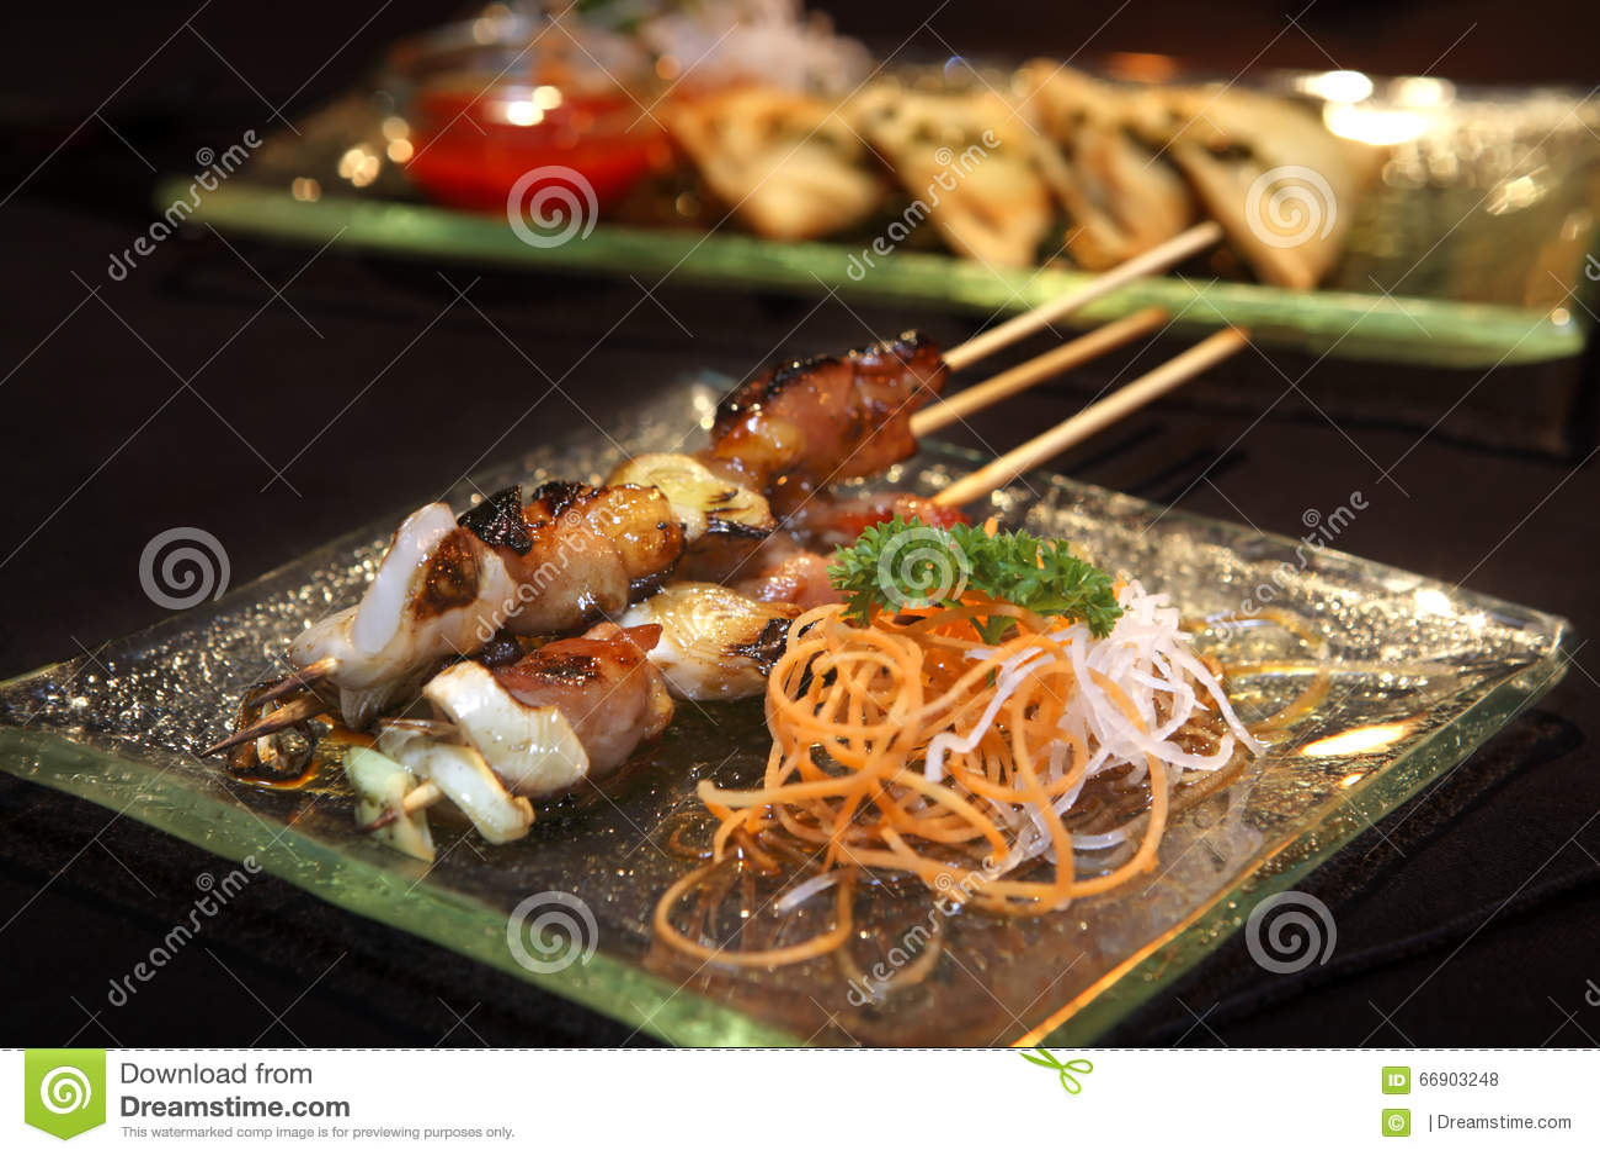 Индонезийская еда